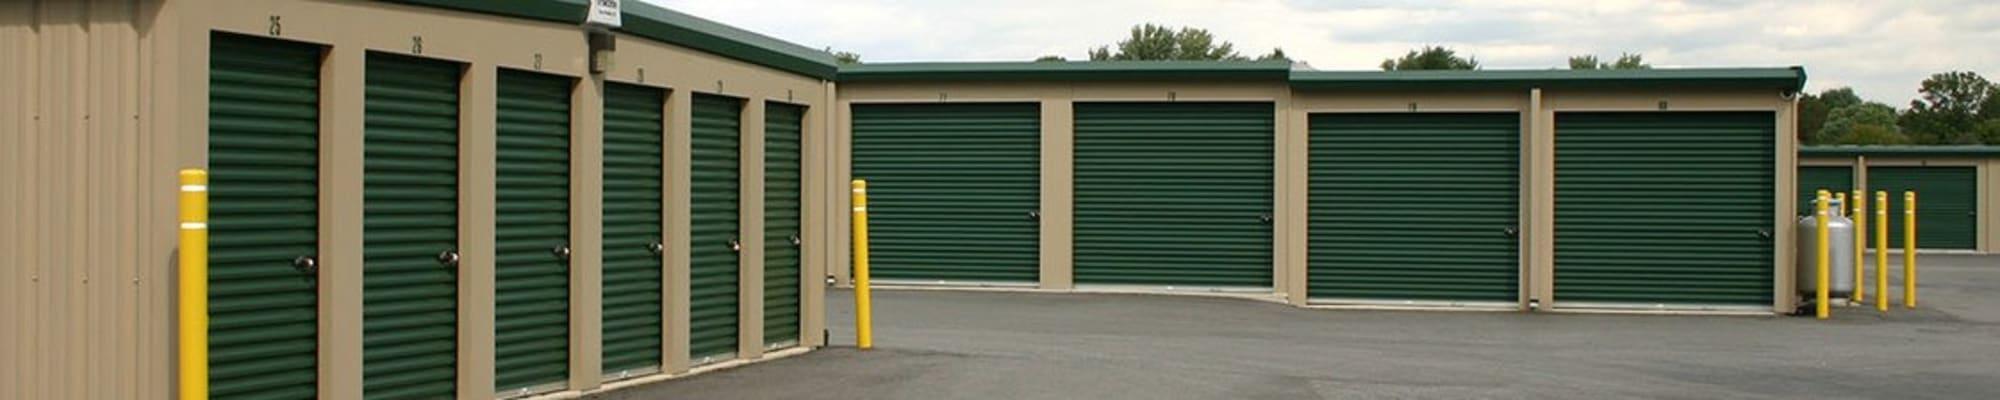 Storage units at Storage World in Reading, Pennsylvania